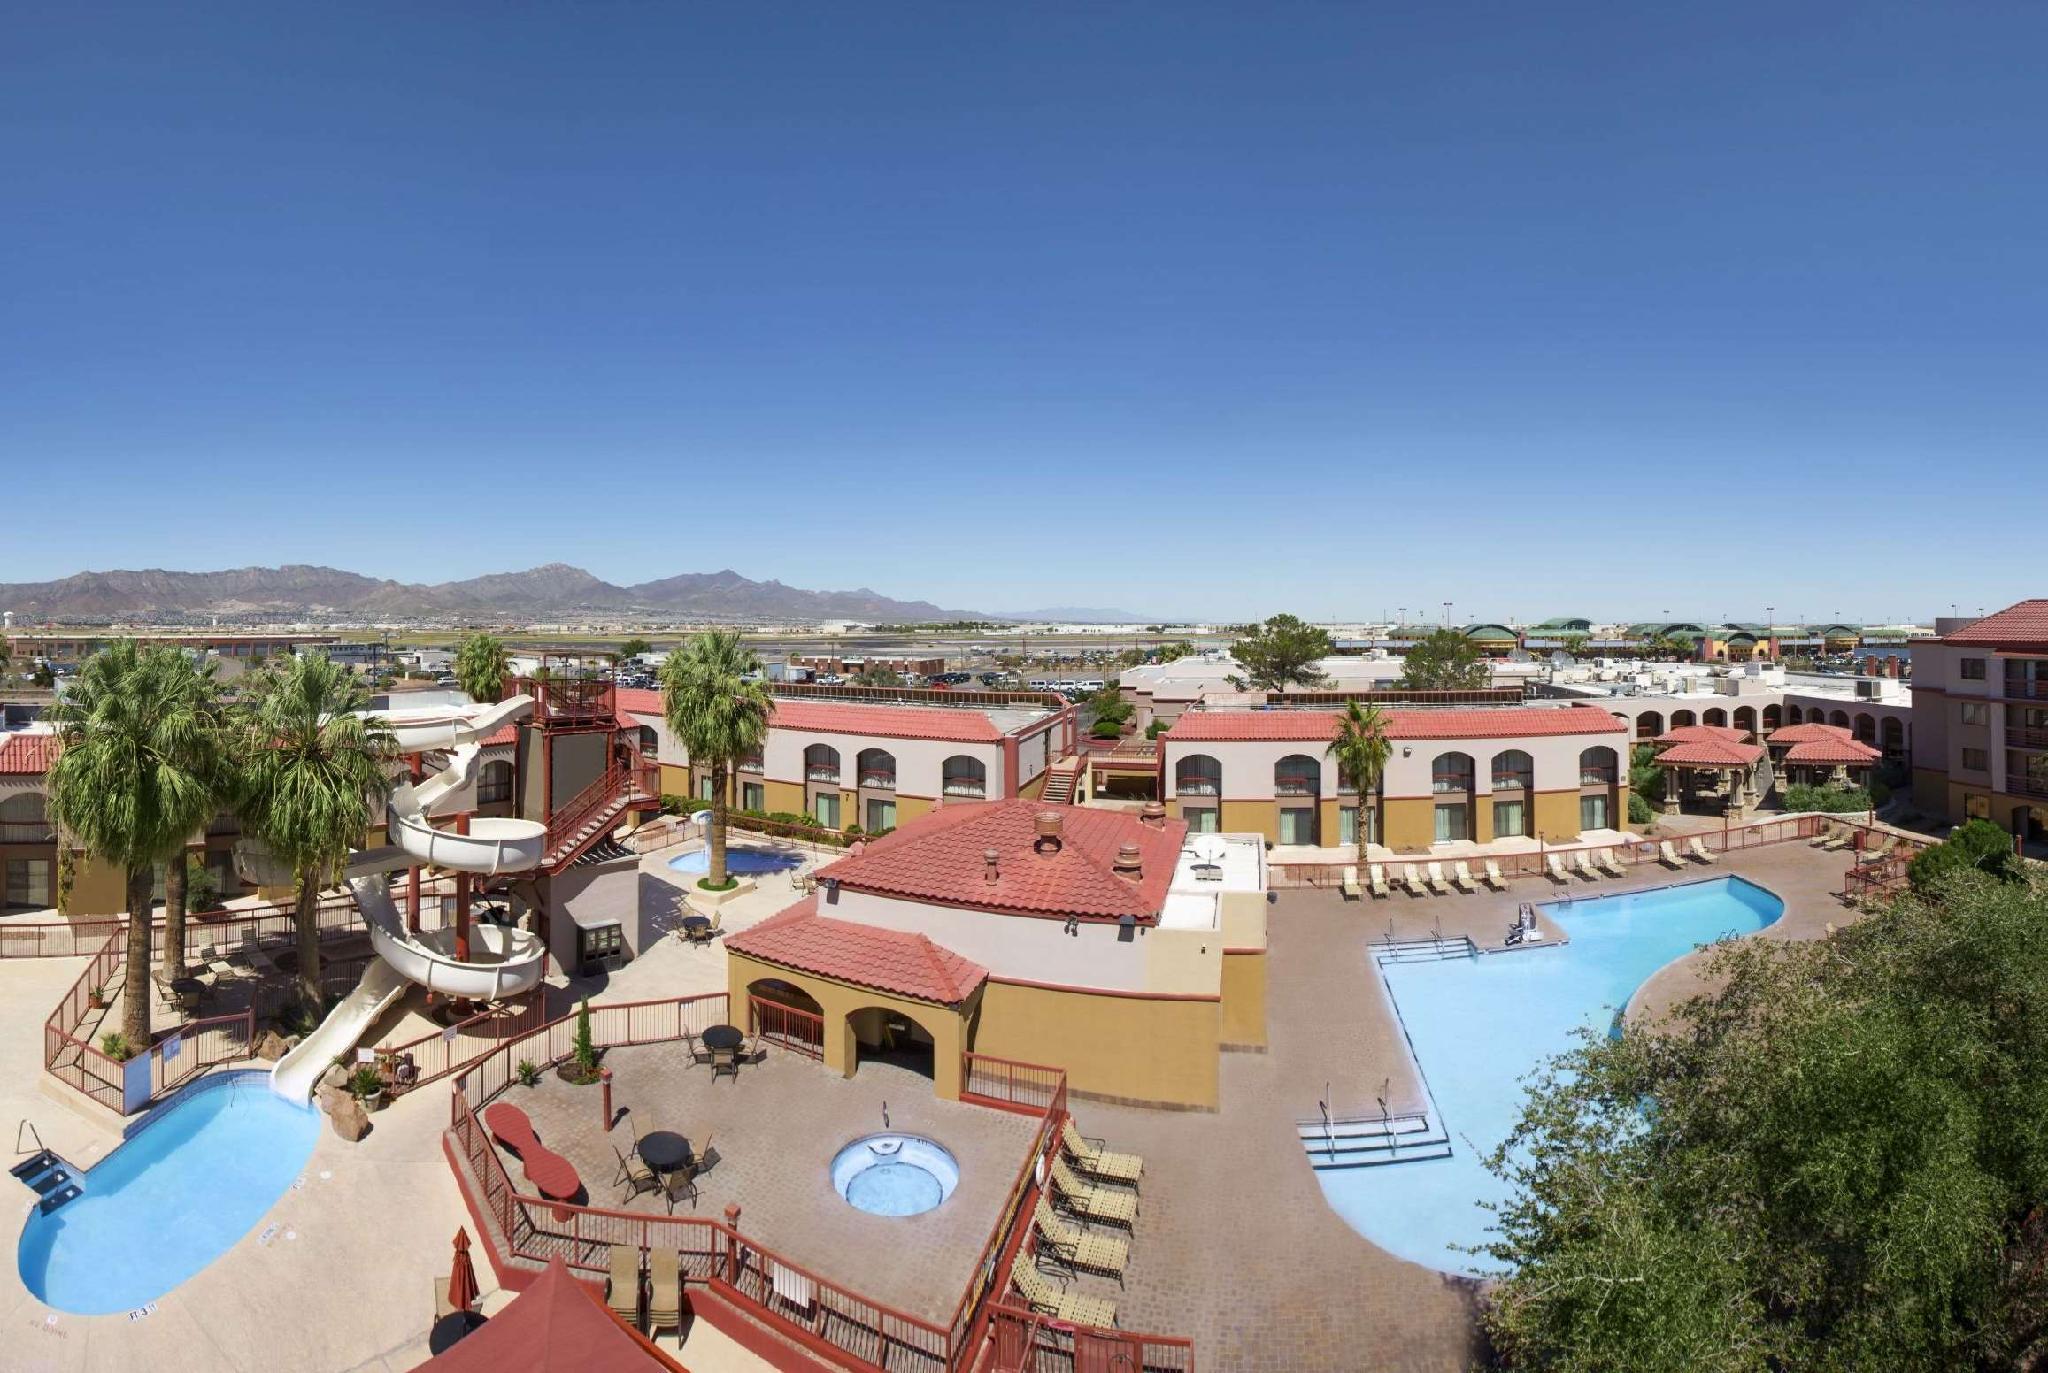 Wyndham El Paso Airport Hotel And Water Park